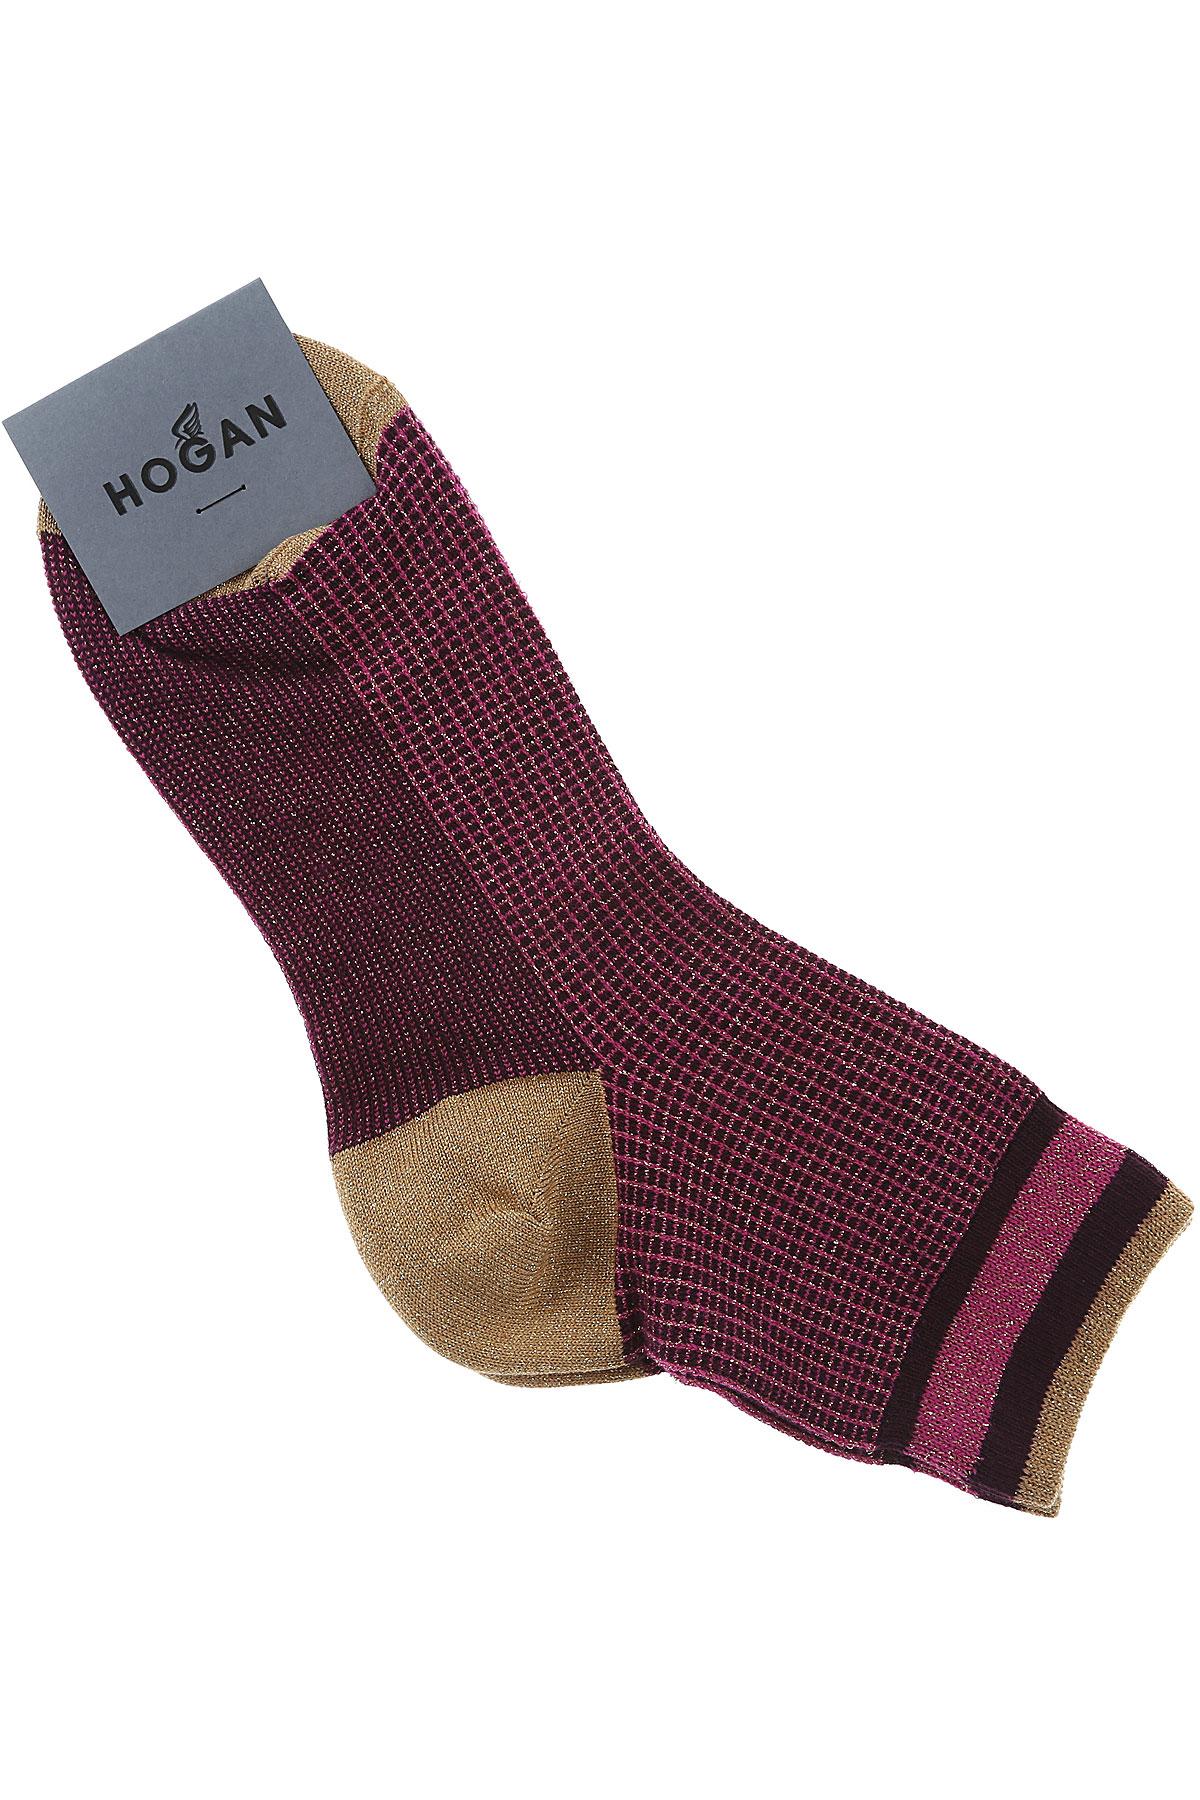 Image of Hogan Socks, Pink, Cotton, 2017